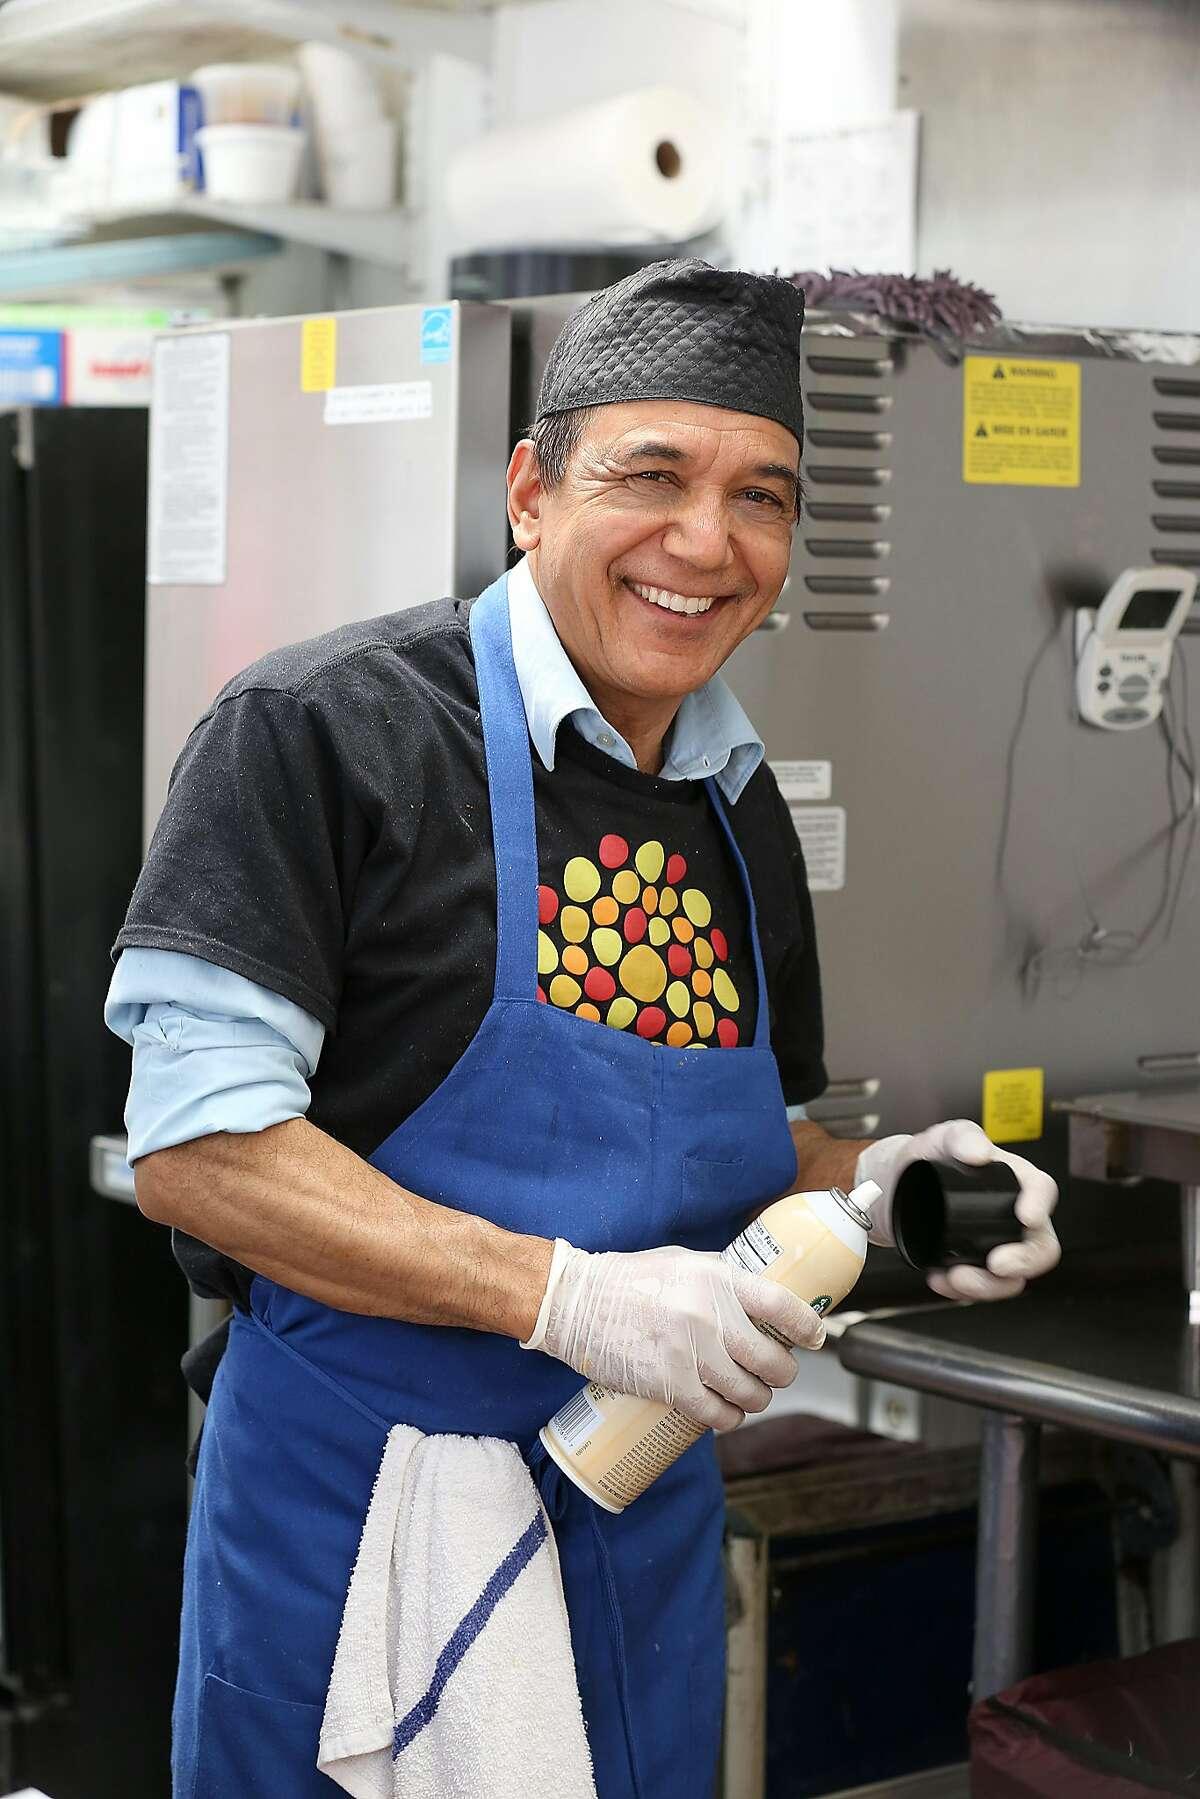 Crew member Bhimsen Thapa Chhetri works at Bini's Kitchen on Market St. on Friday, May 11, 2018 in San Francisco, Calif.